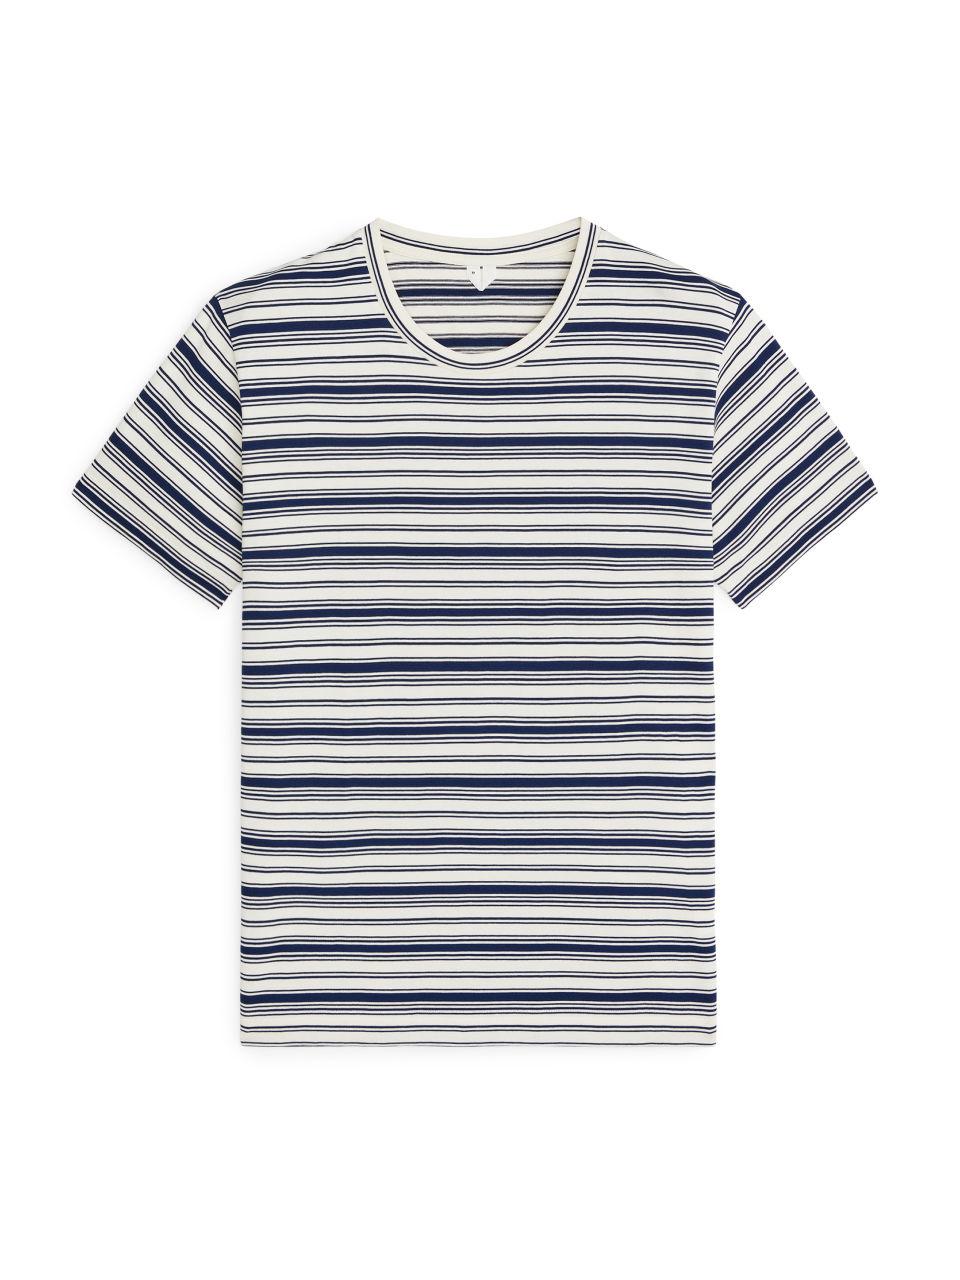 Striped T-Shirt - White